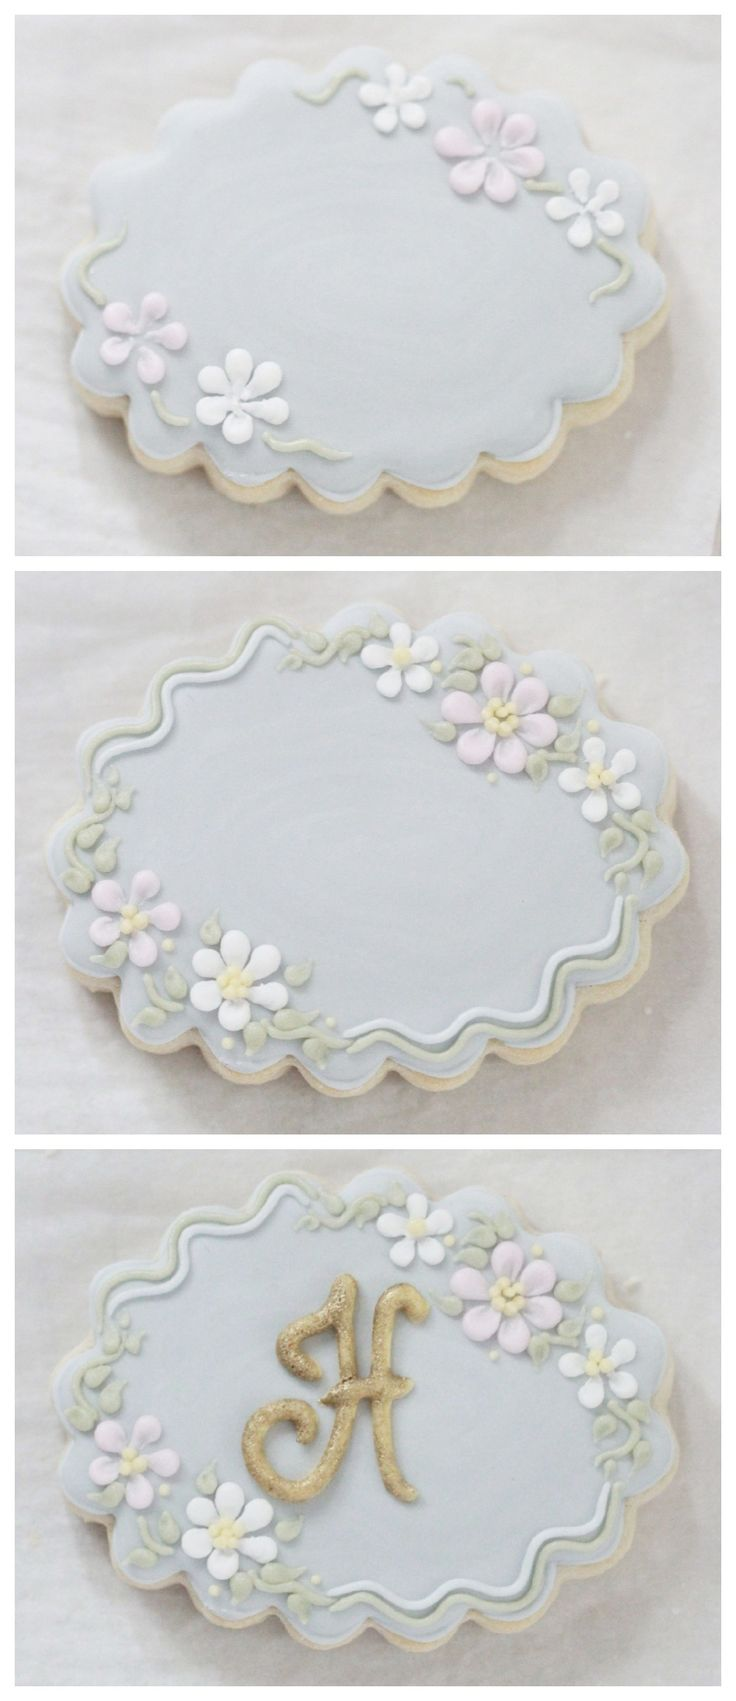 Decorating Monogram Cookie Steps